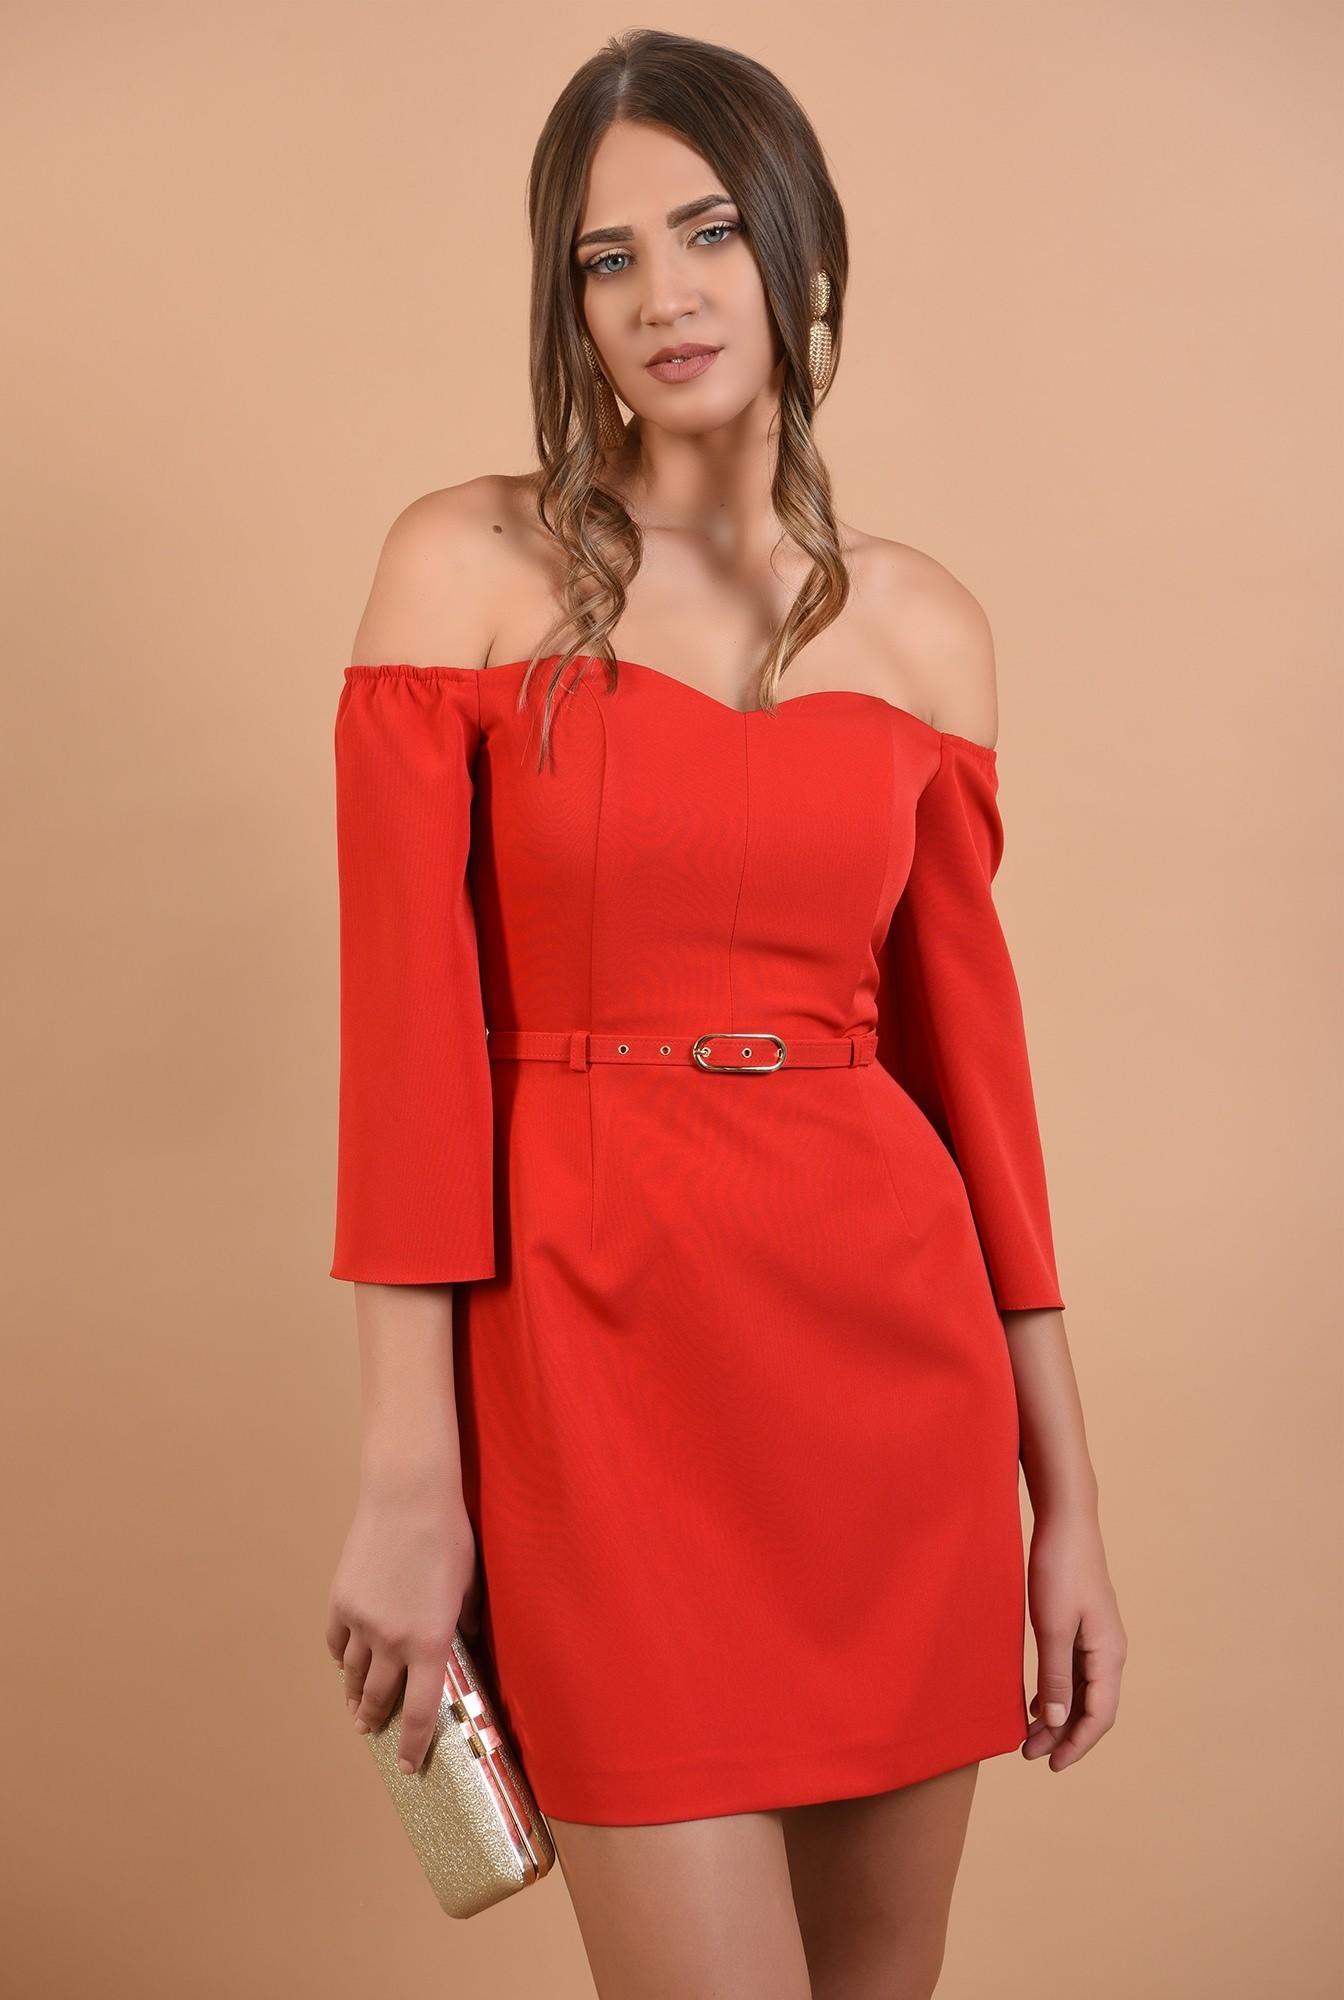 0 - rochie eleganta, mini, rosie, umeri dezgoliti, decolteu inima, Poema